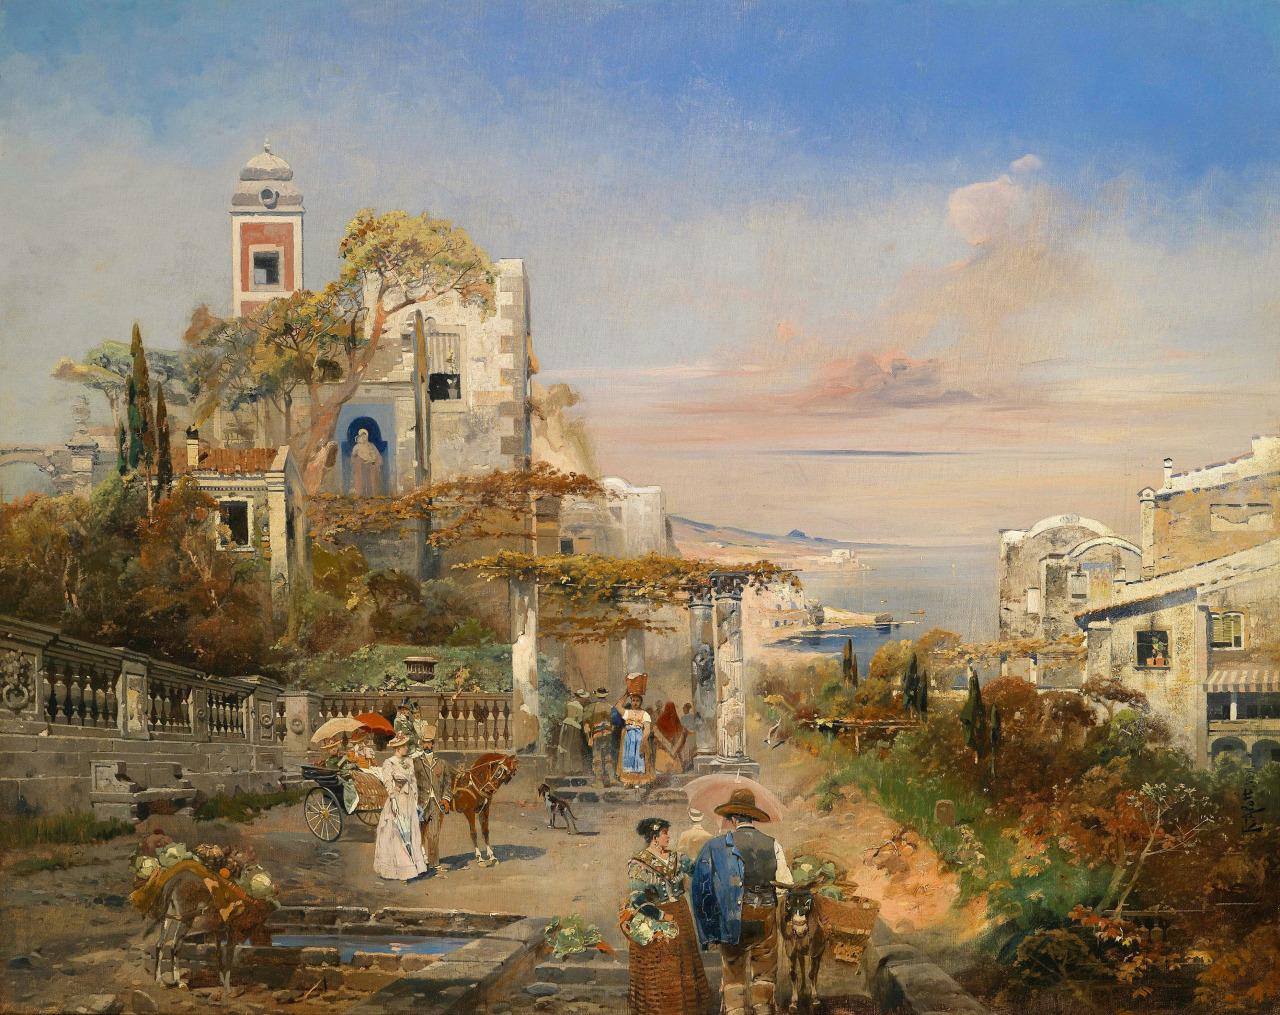 Robert Alott - Southern Capriccio, 1891